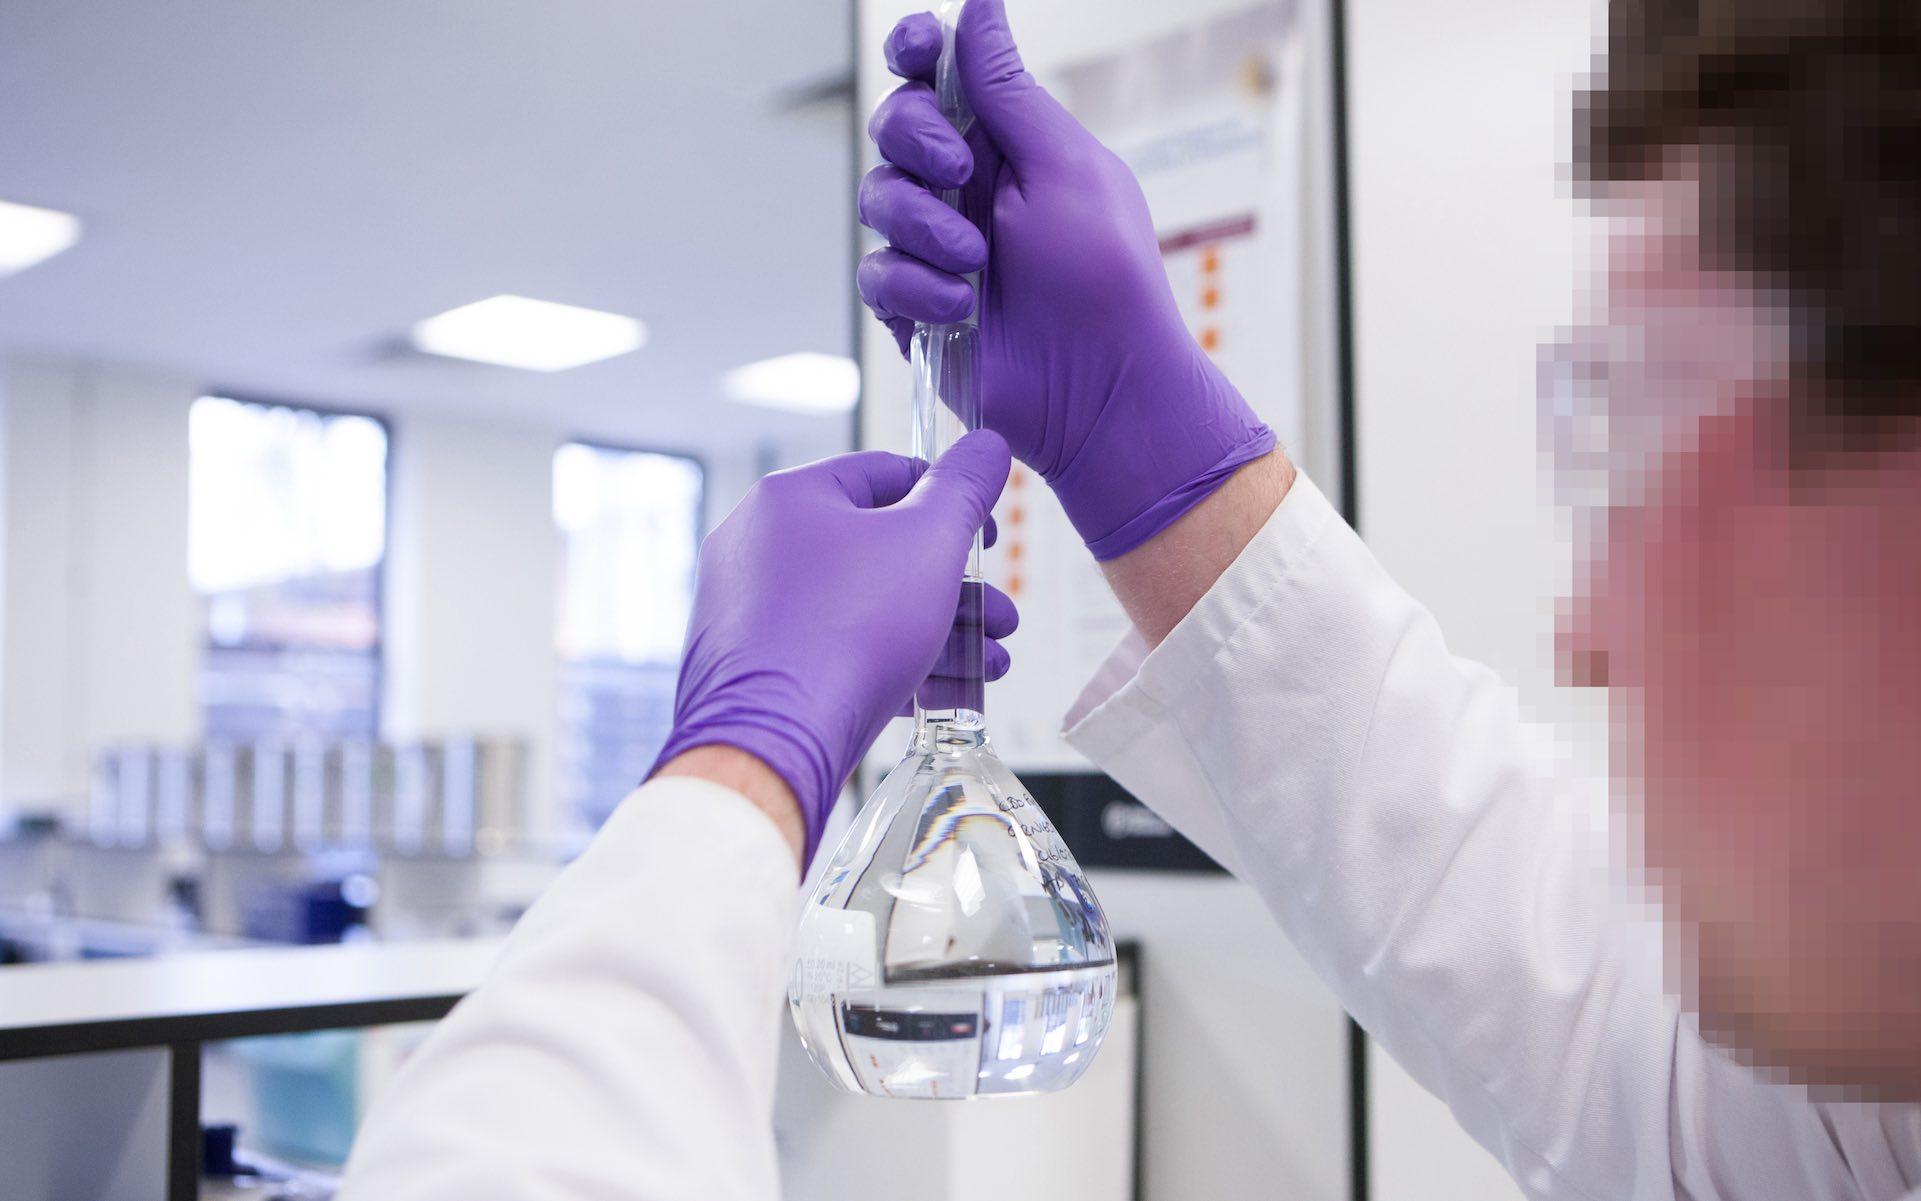 Epidiolex, sativex, gw pharmaceuticals, greenwich biosciences